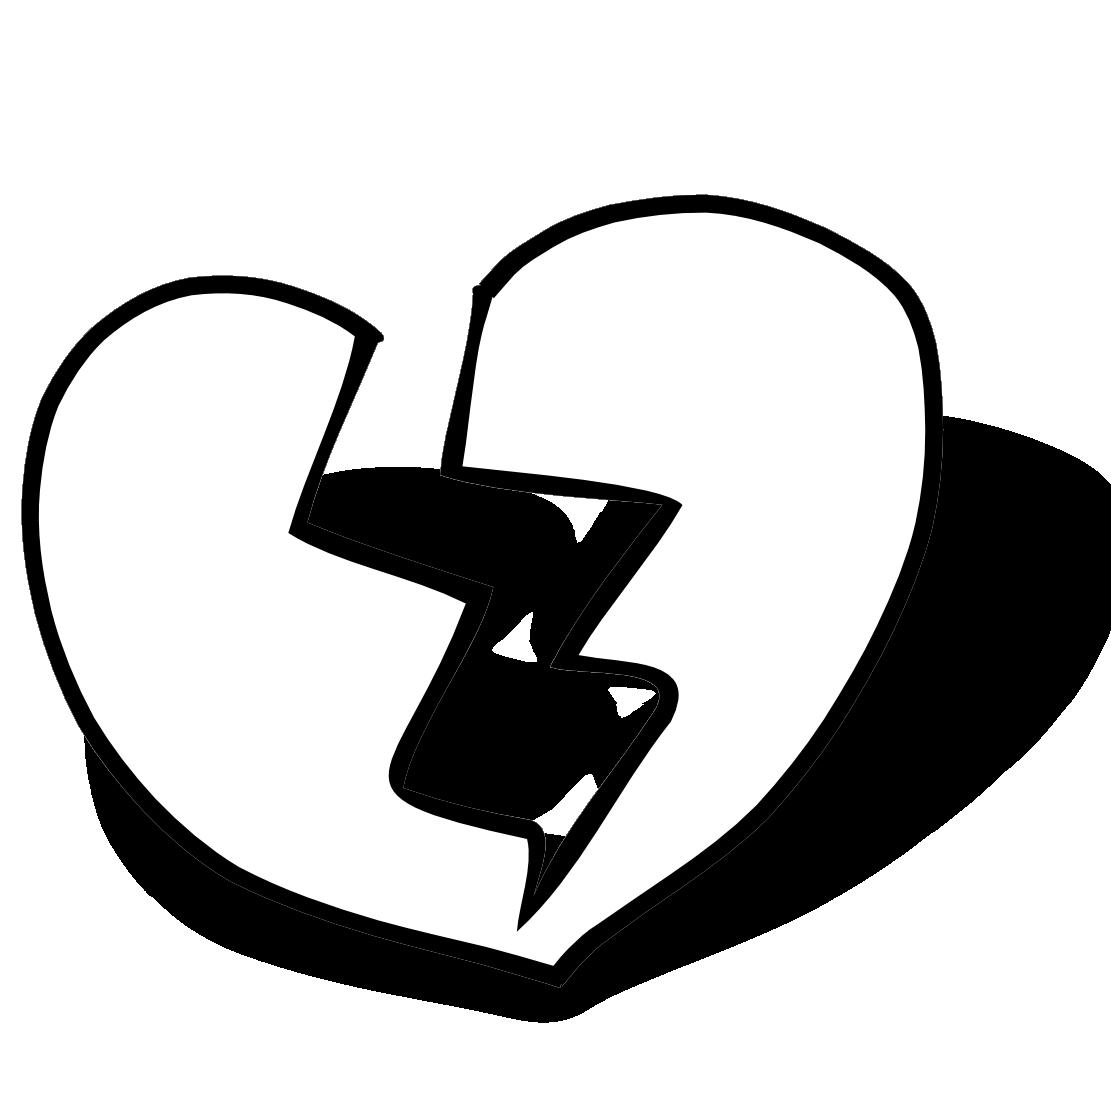 broken heart clipart black and white-broken heart clipart black and white-9